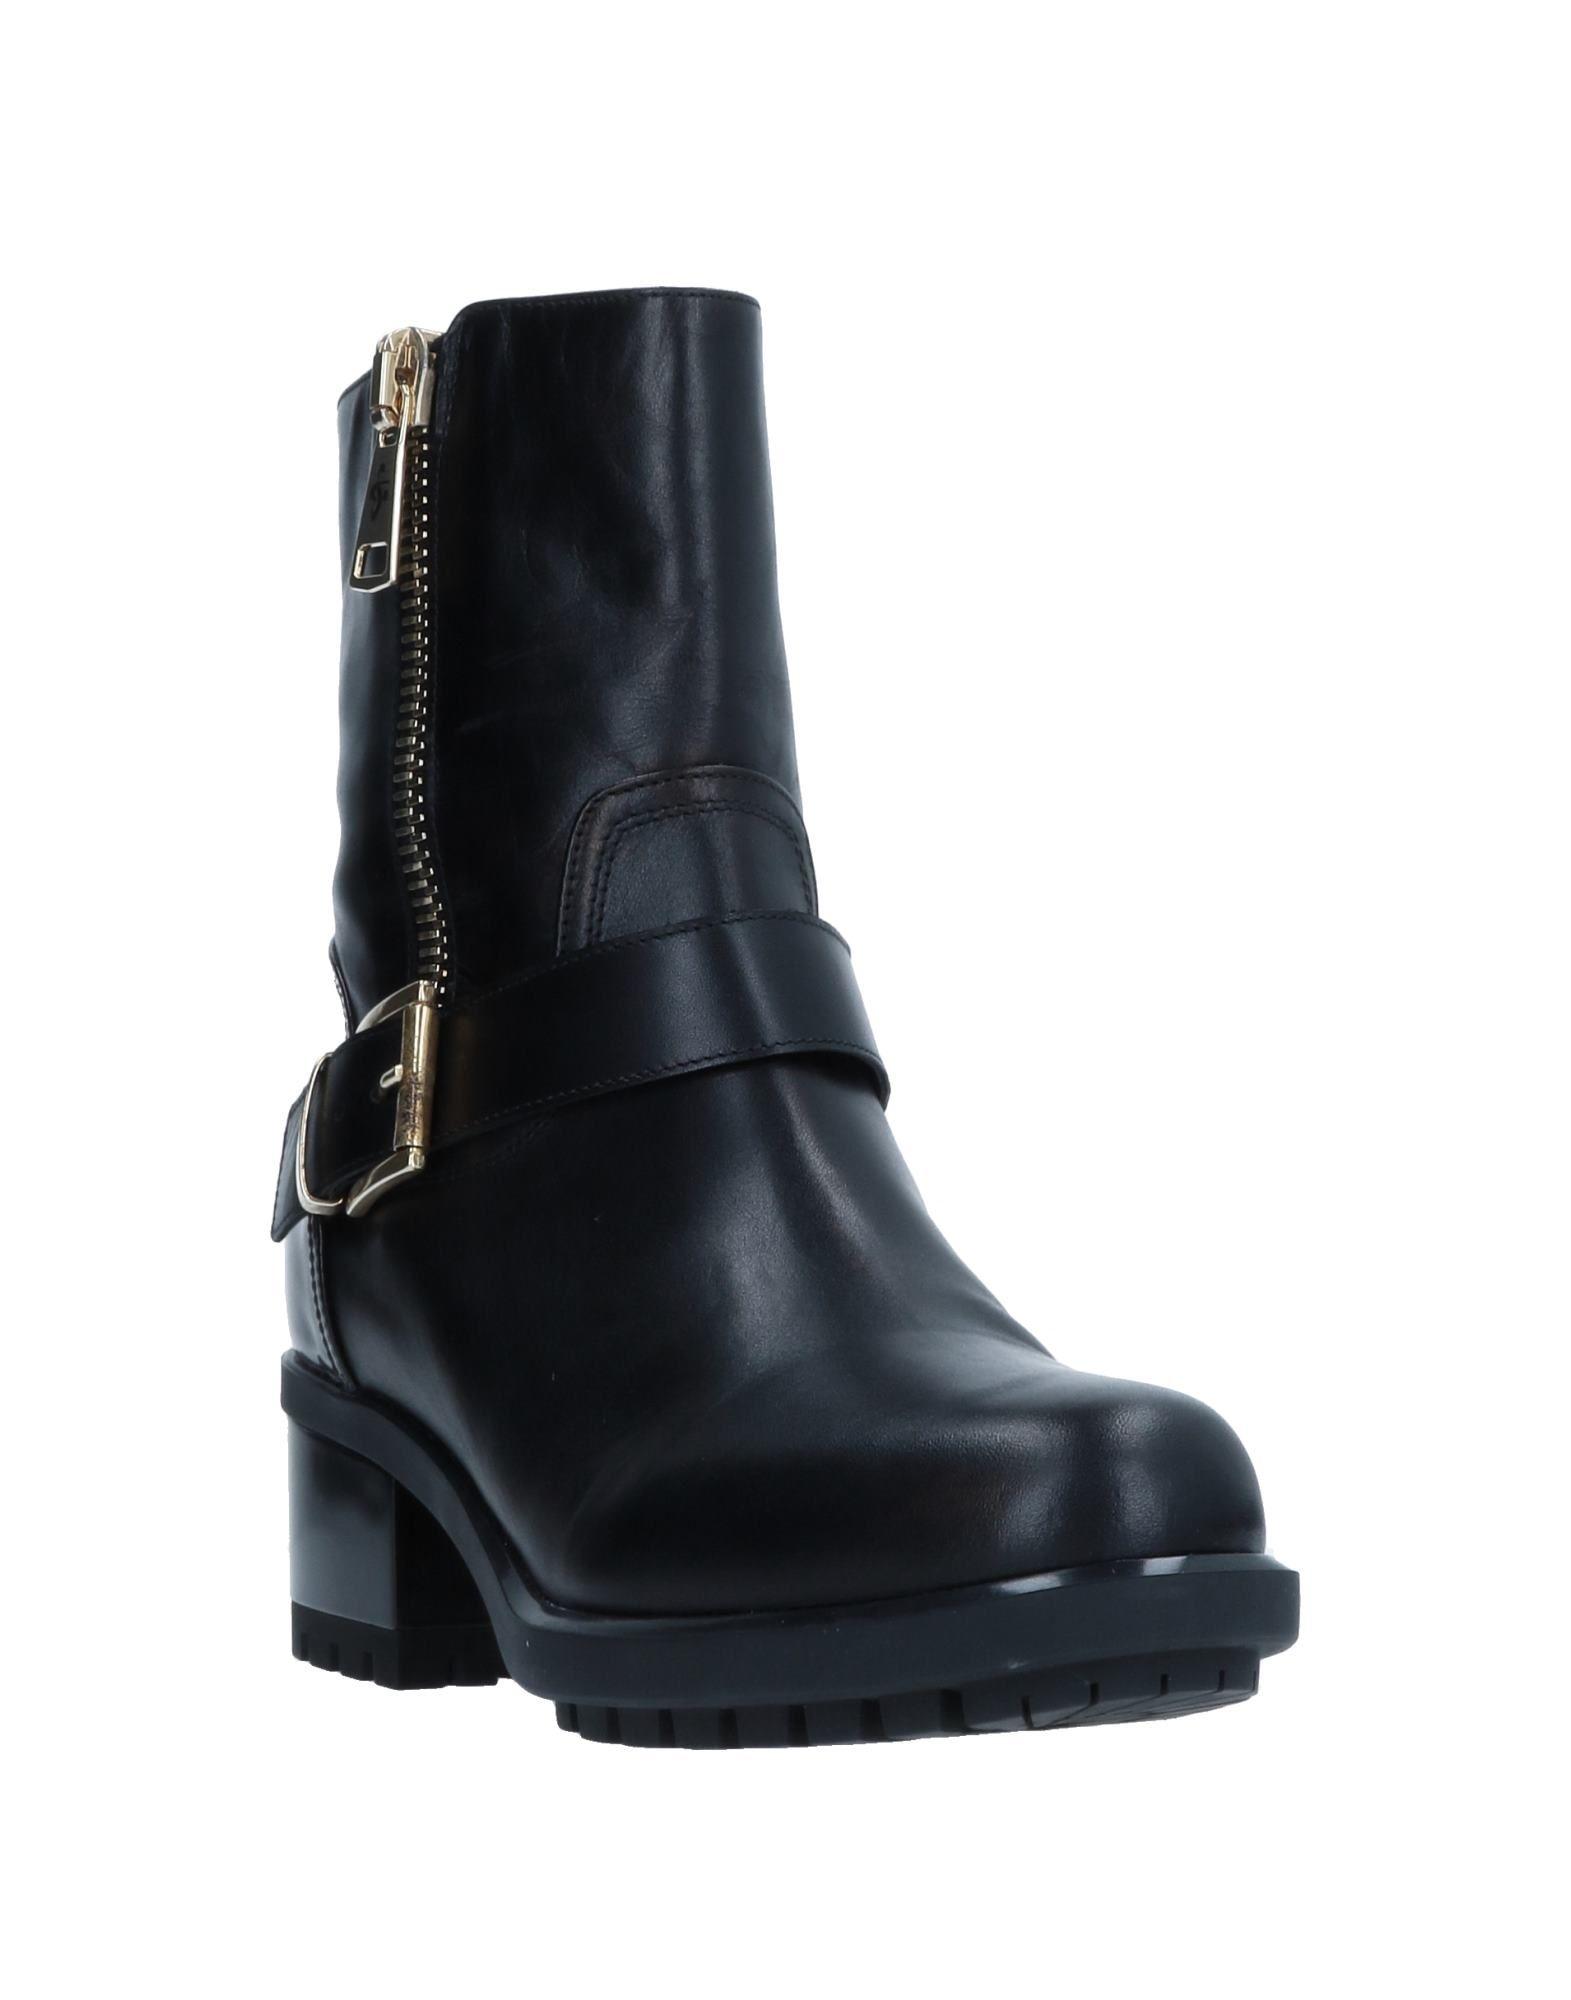 Stilvolle billige Schuhe Guido 11552757PQ Sgariglia Stiefelette Damen  11552757PQ Guido 2f0c0f